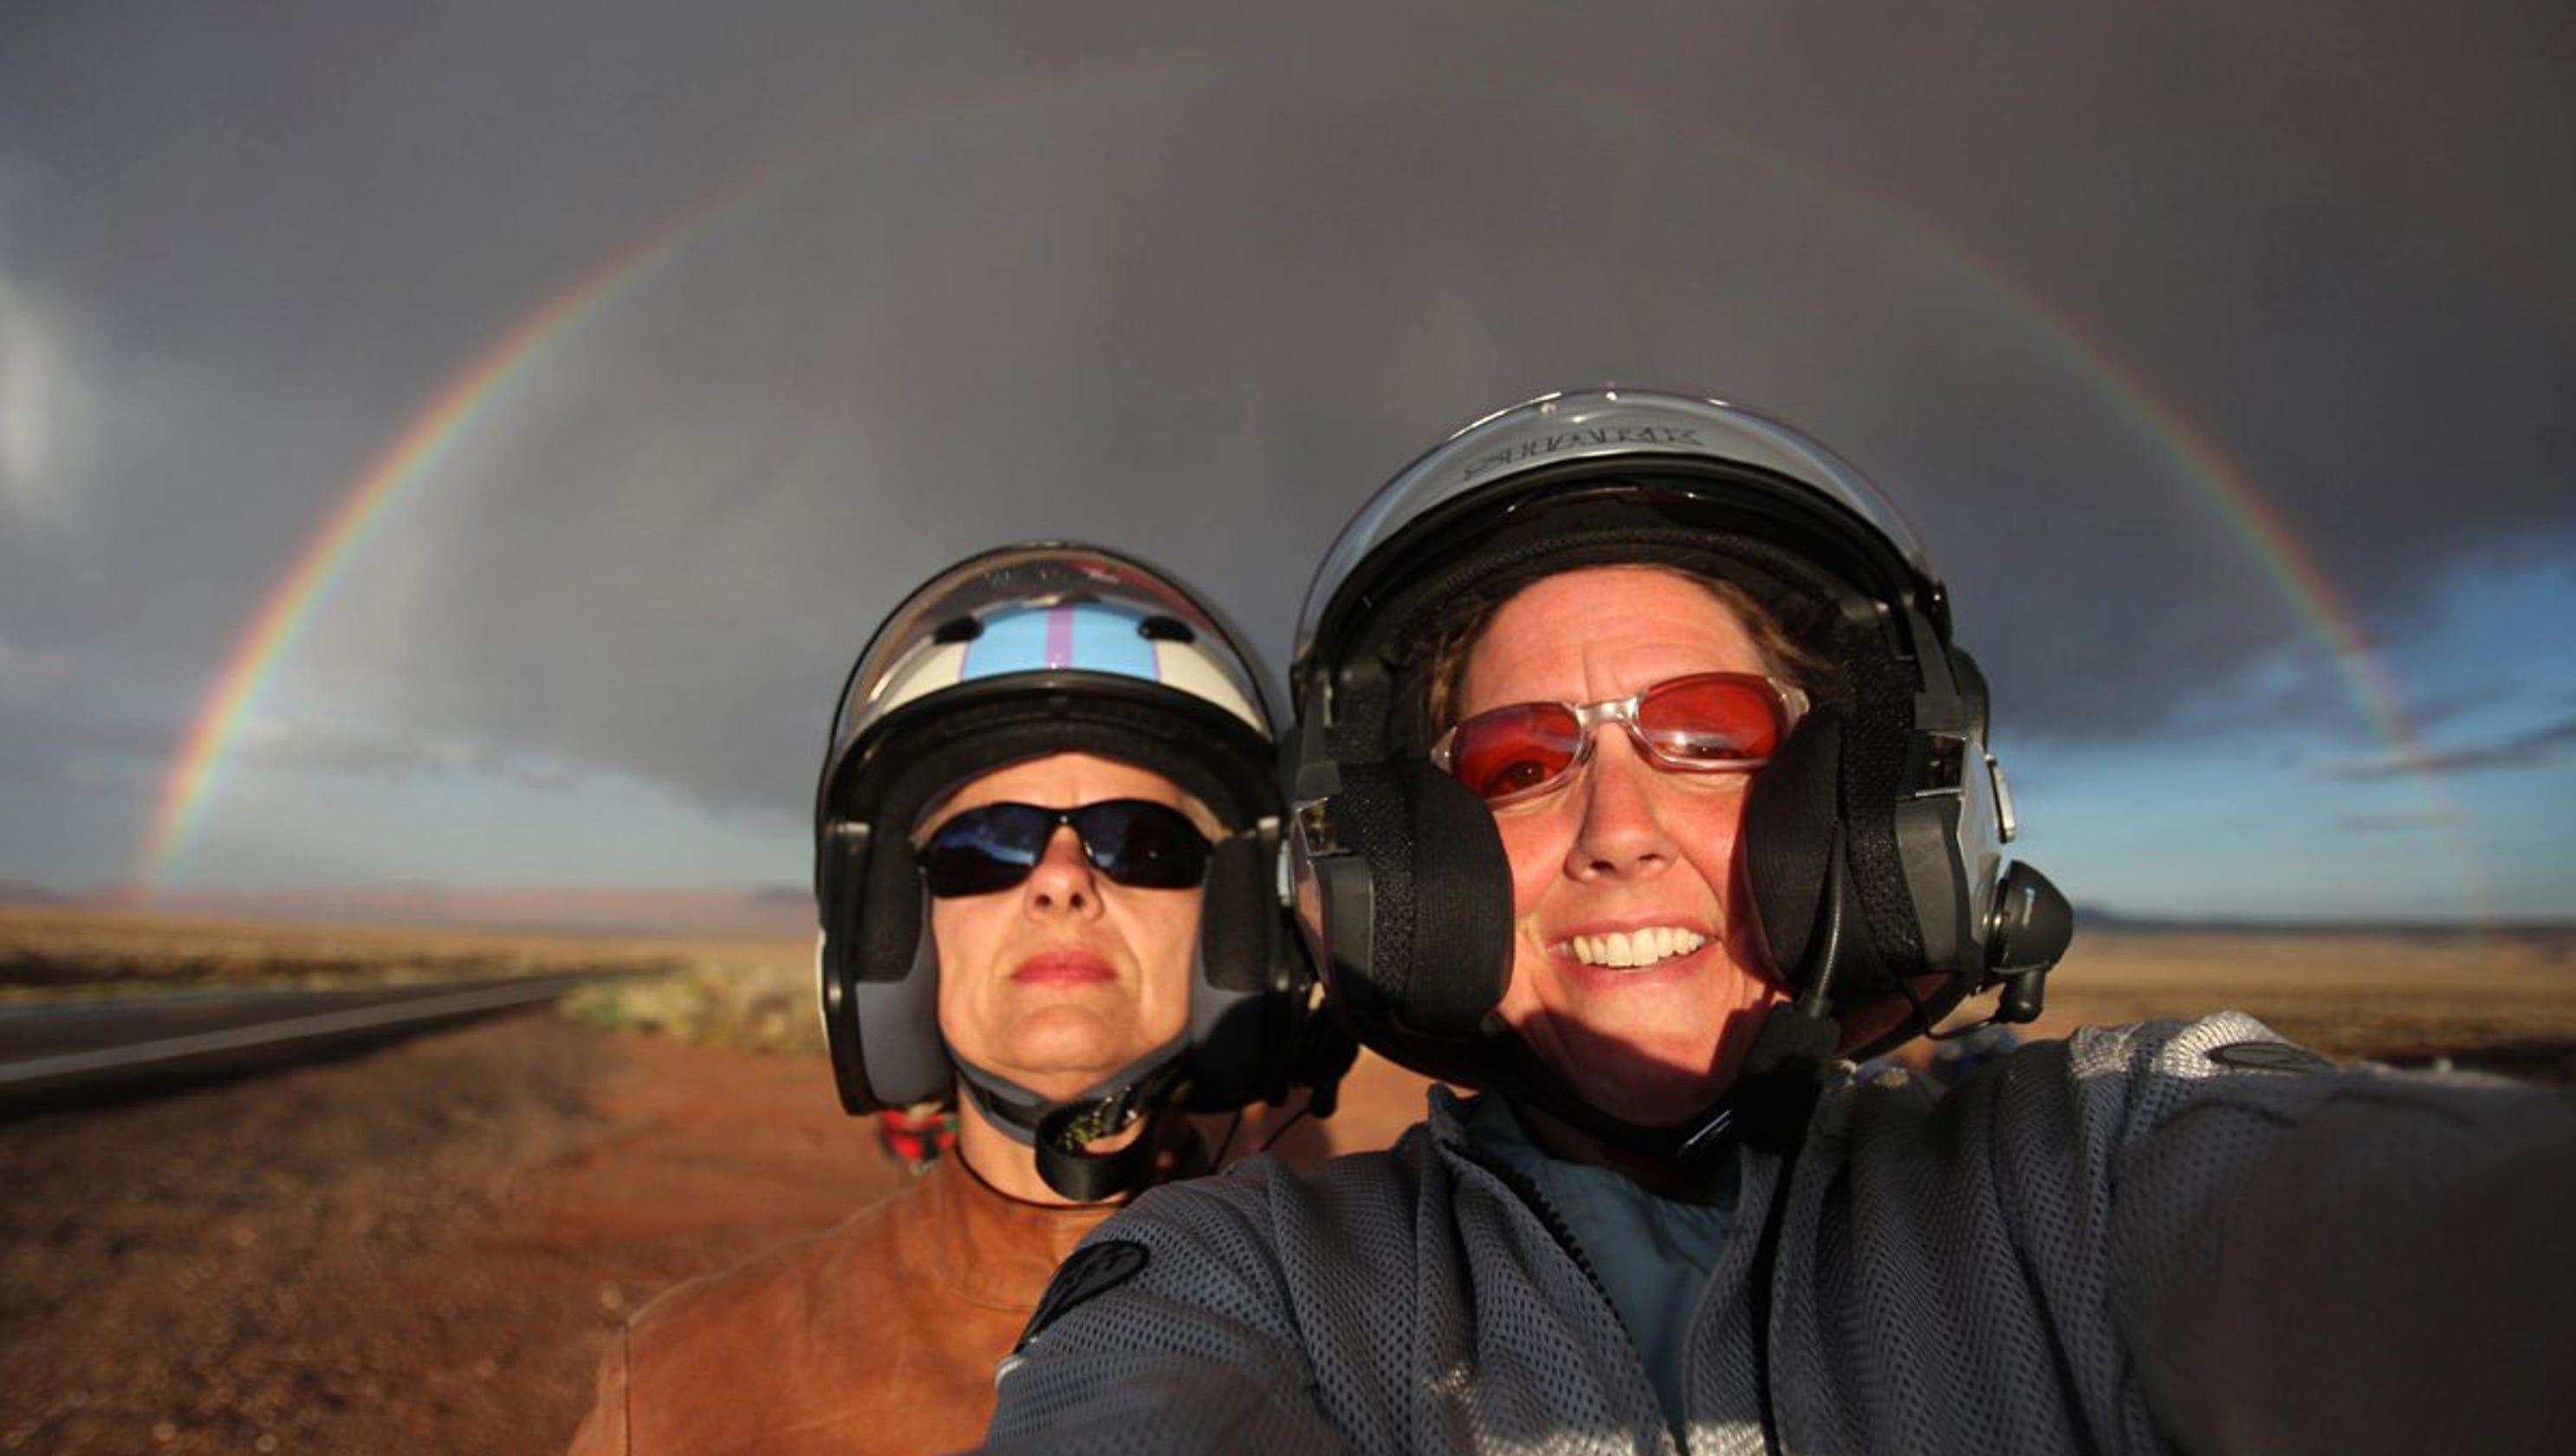 Harley Rides Home from around US to celebrate anniversary